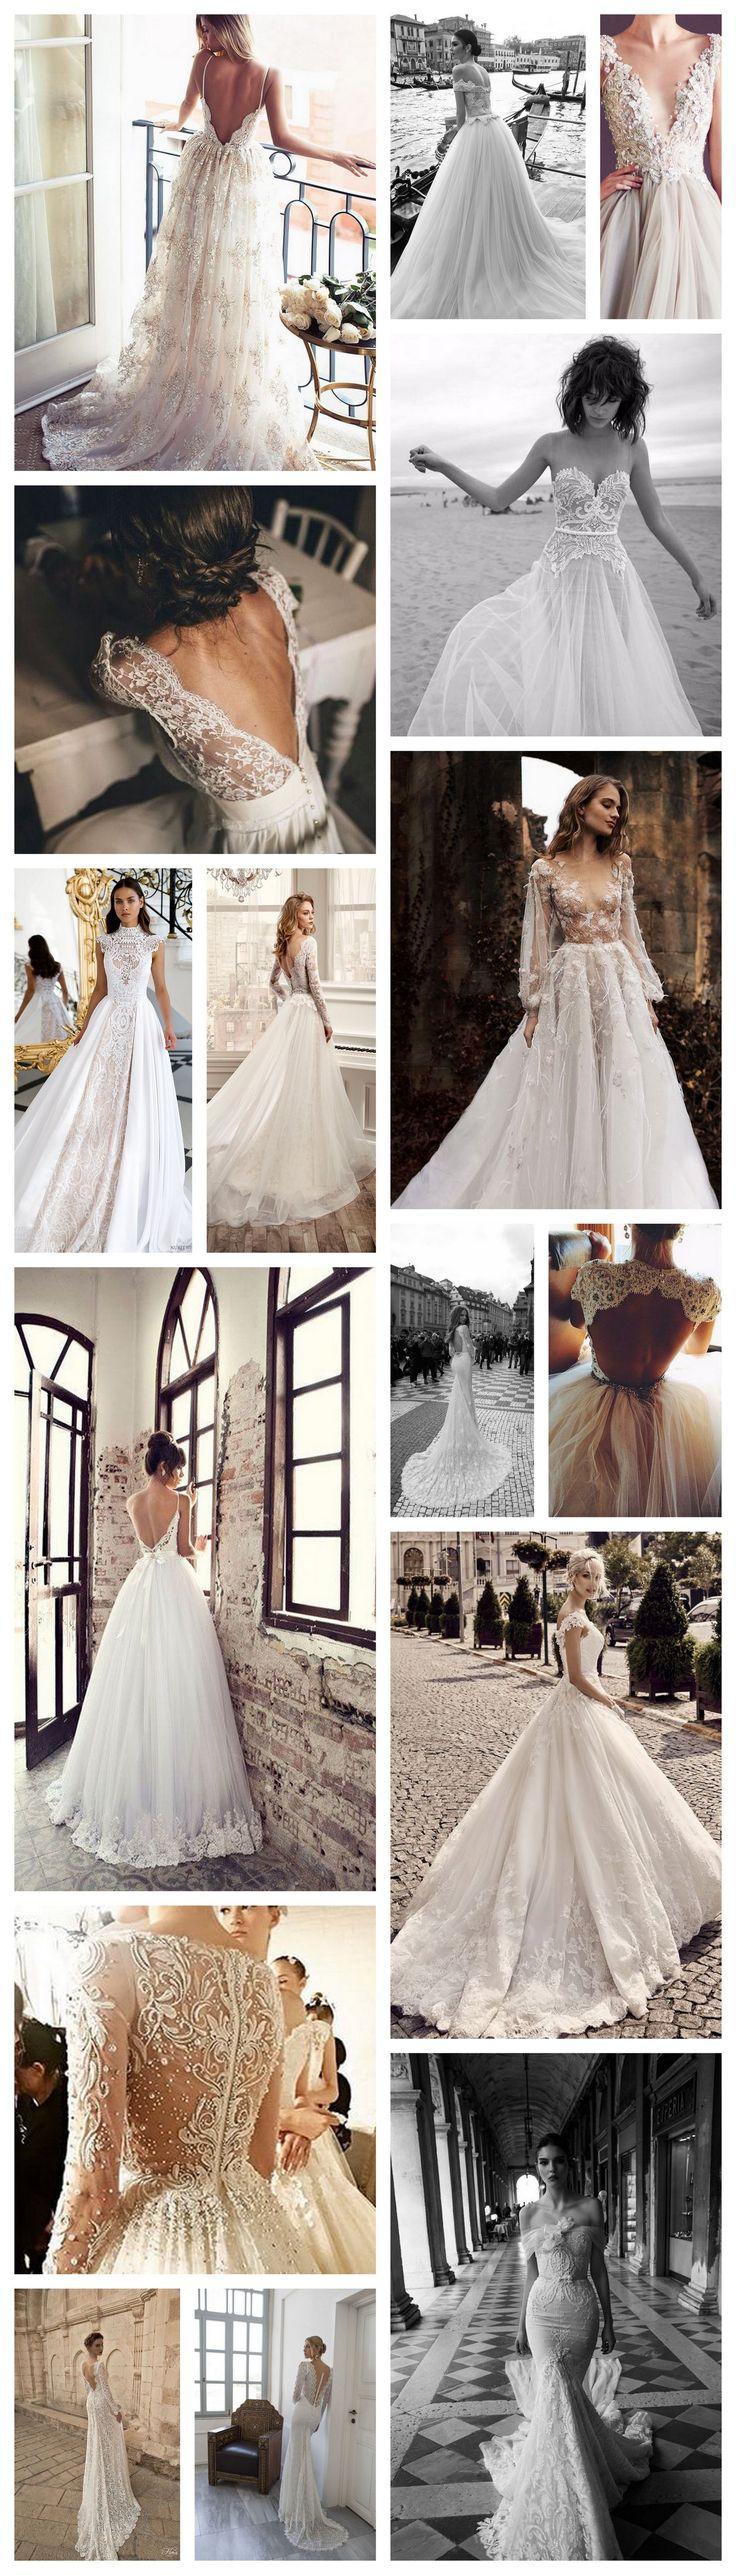 Kenza Brudkl 228 Nning Weddings Br 246 Llop Pinterest